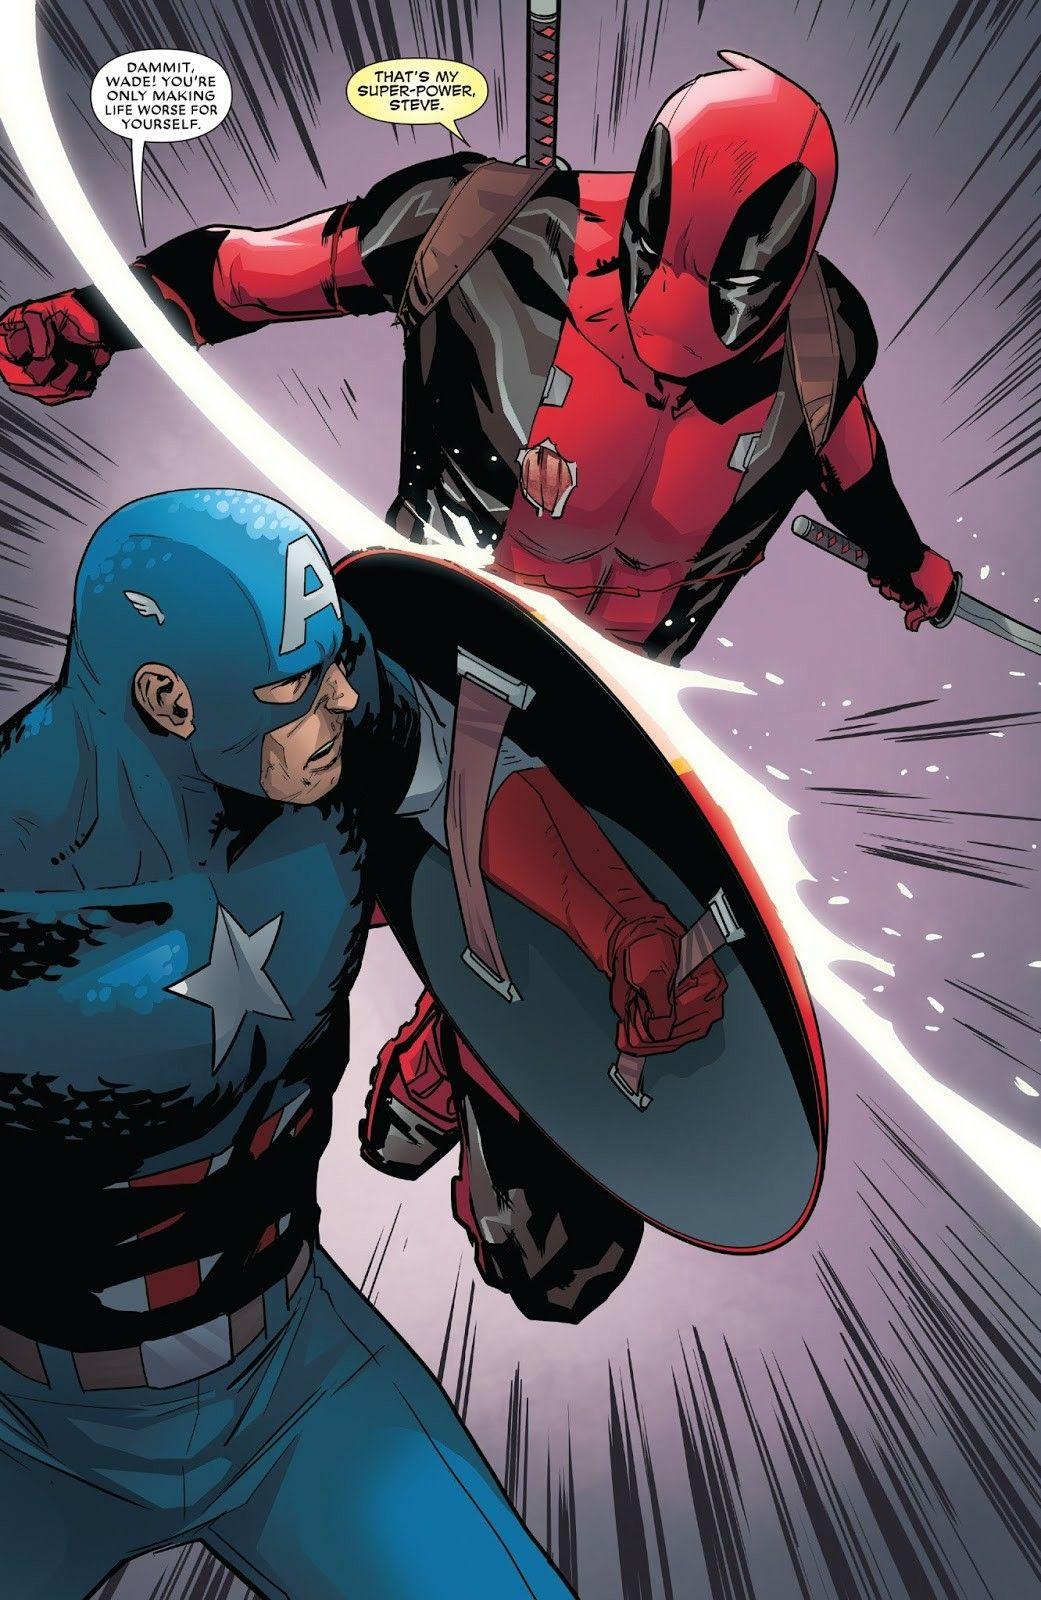 Captain America Vs Deadpool Despicable Deadpool 296 Deadpool Funny Comics Marvel Memes Marvel Deadpool